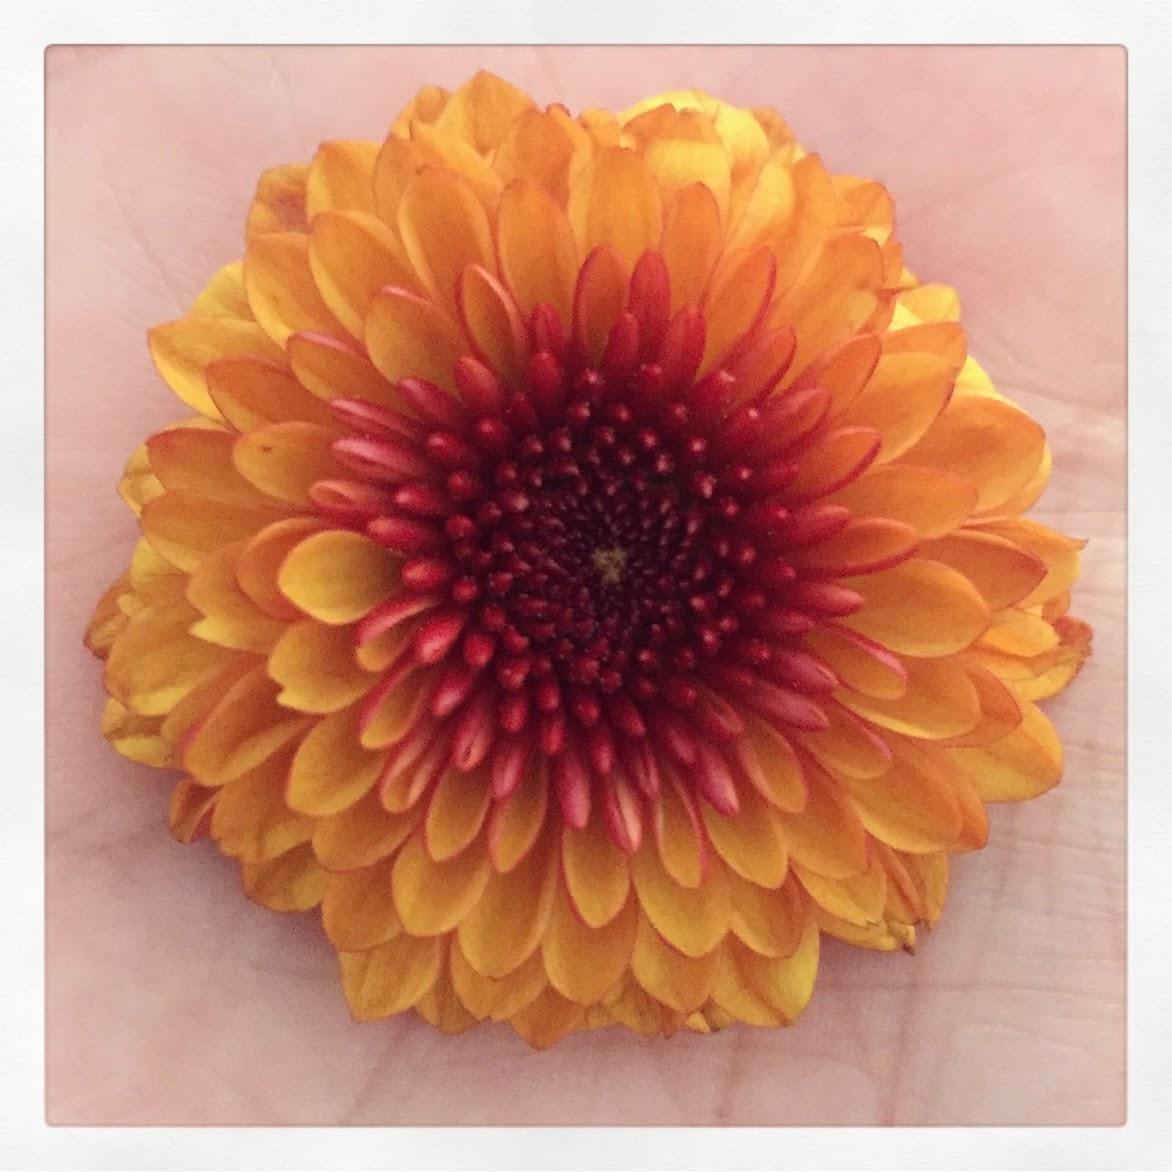 isharethisflowerwithyou.jpg